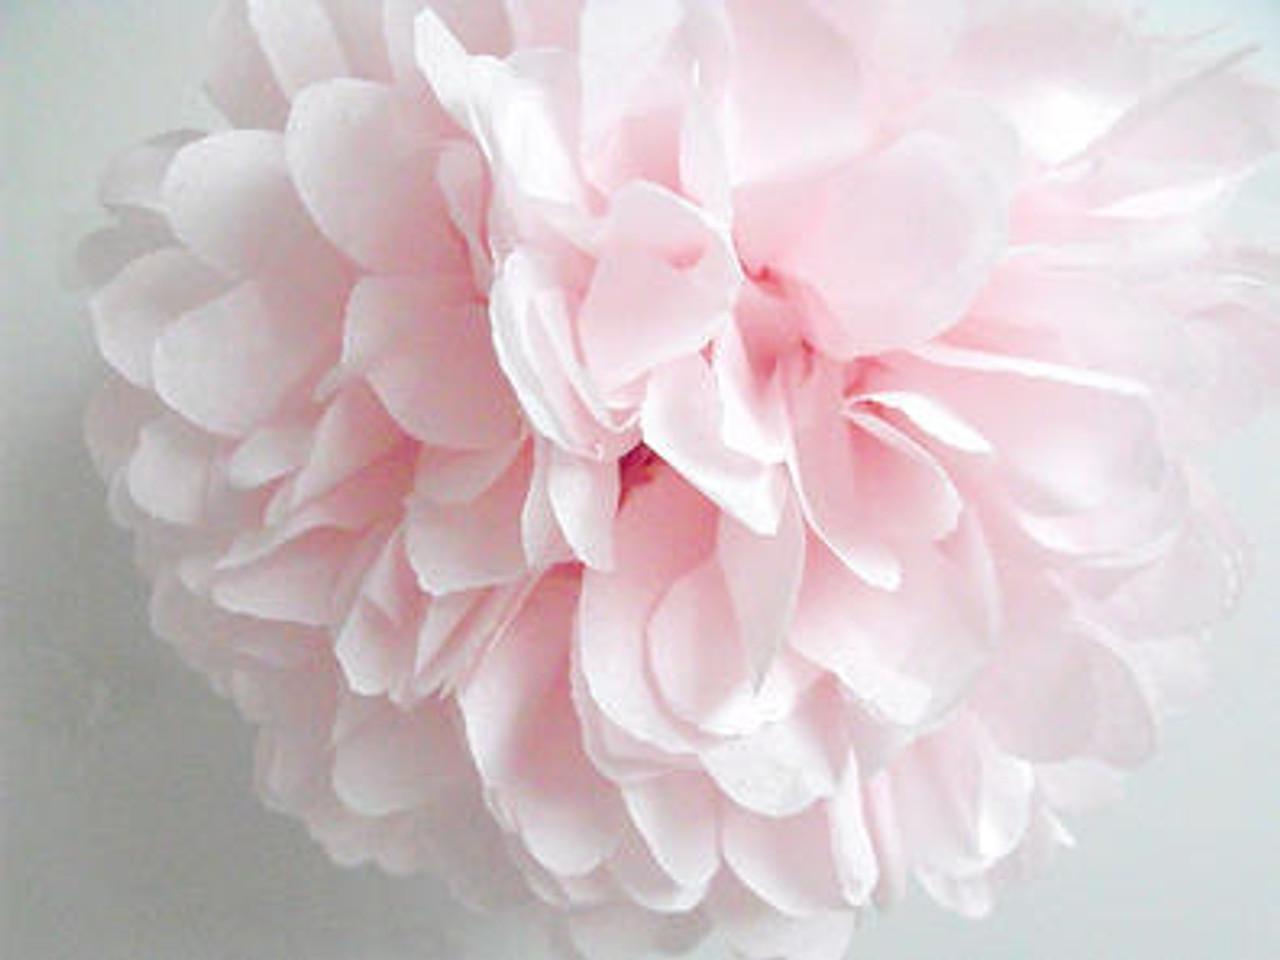 Tissue Paper Pom